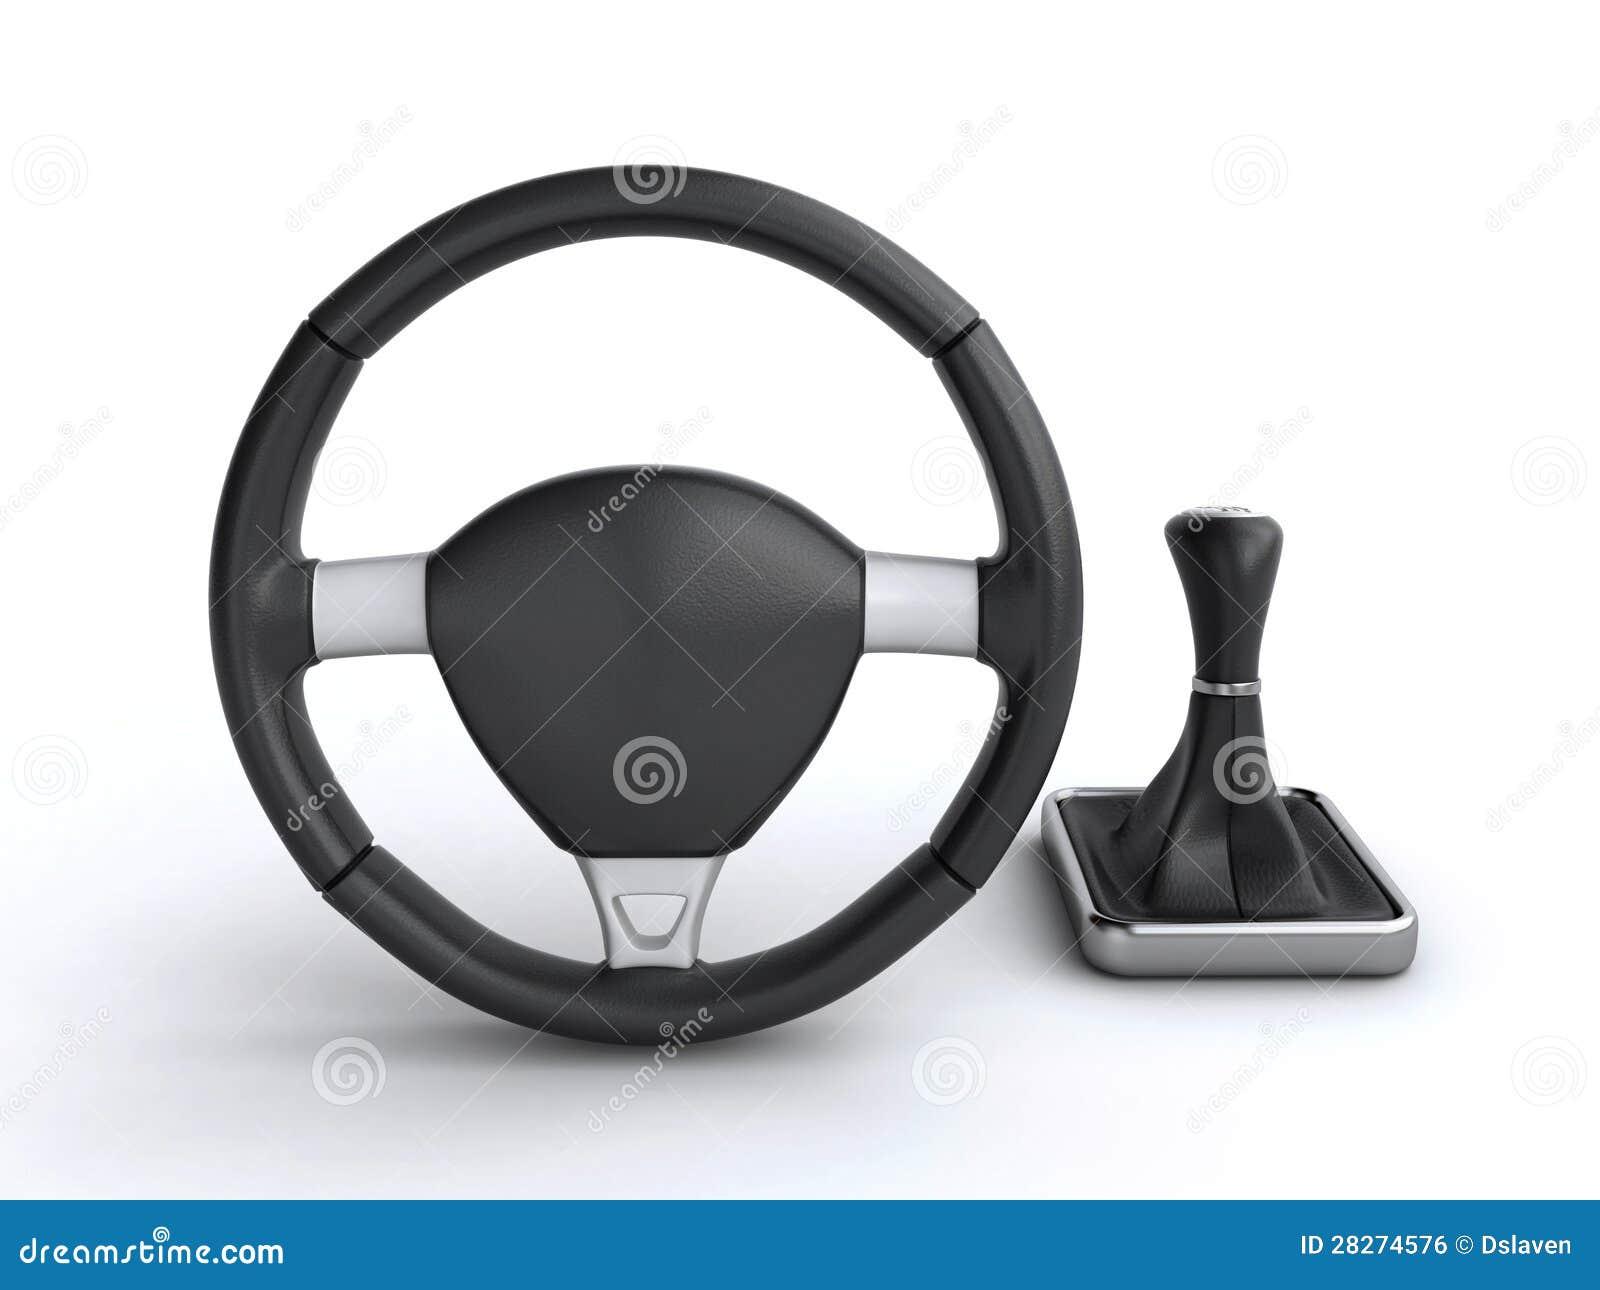 Tractor Steering Wheel Clip Art : Steering gear royalty free stock image cartoondealer